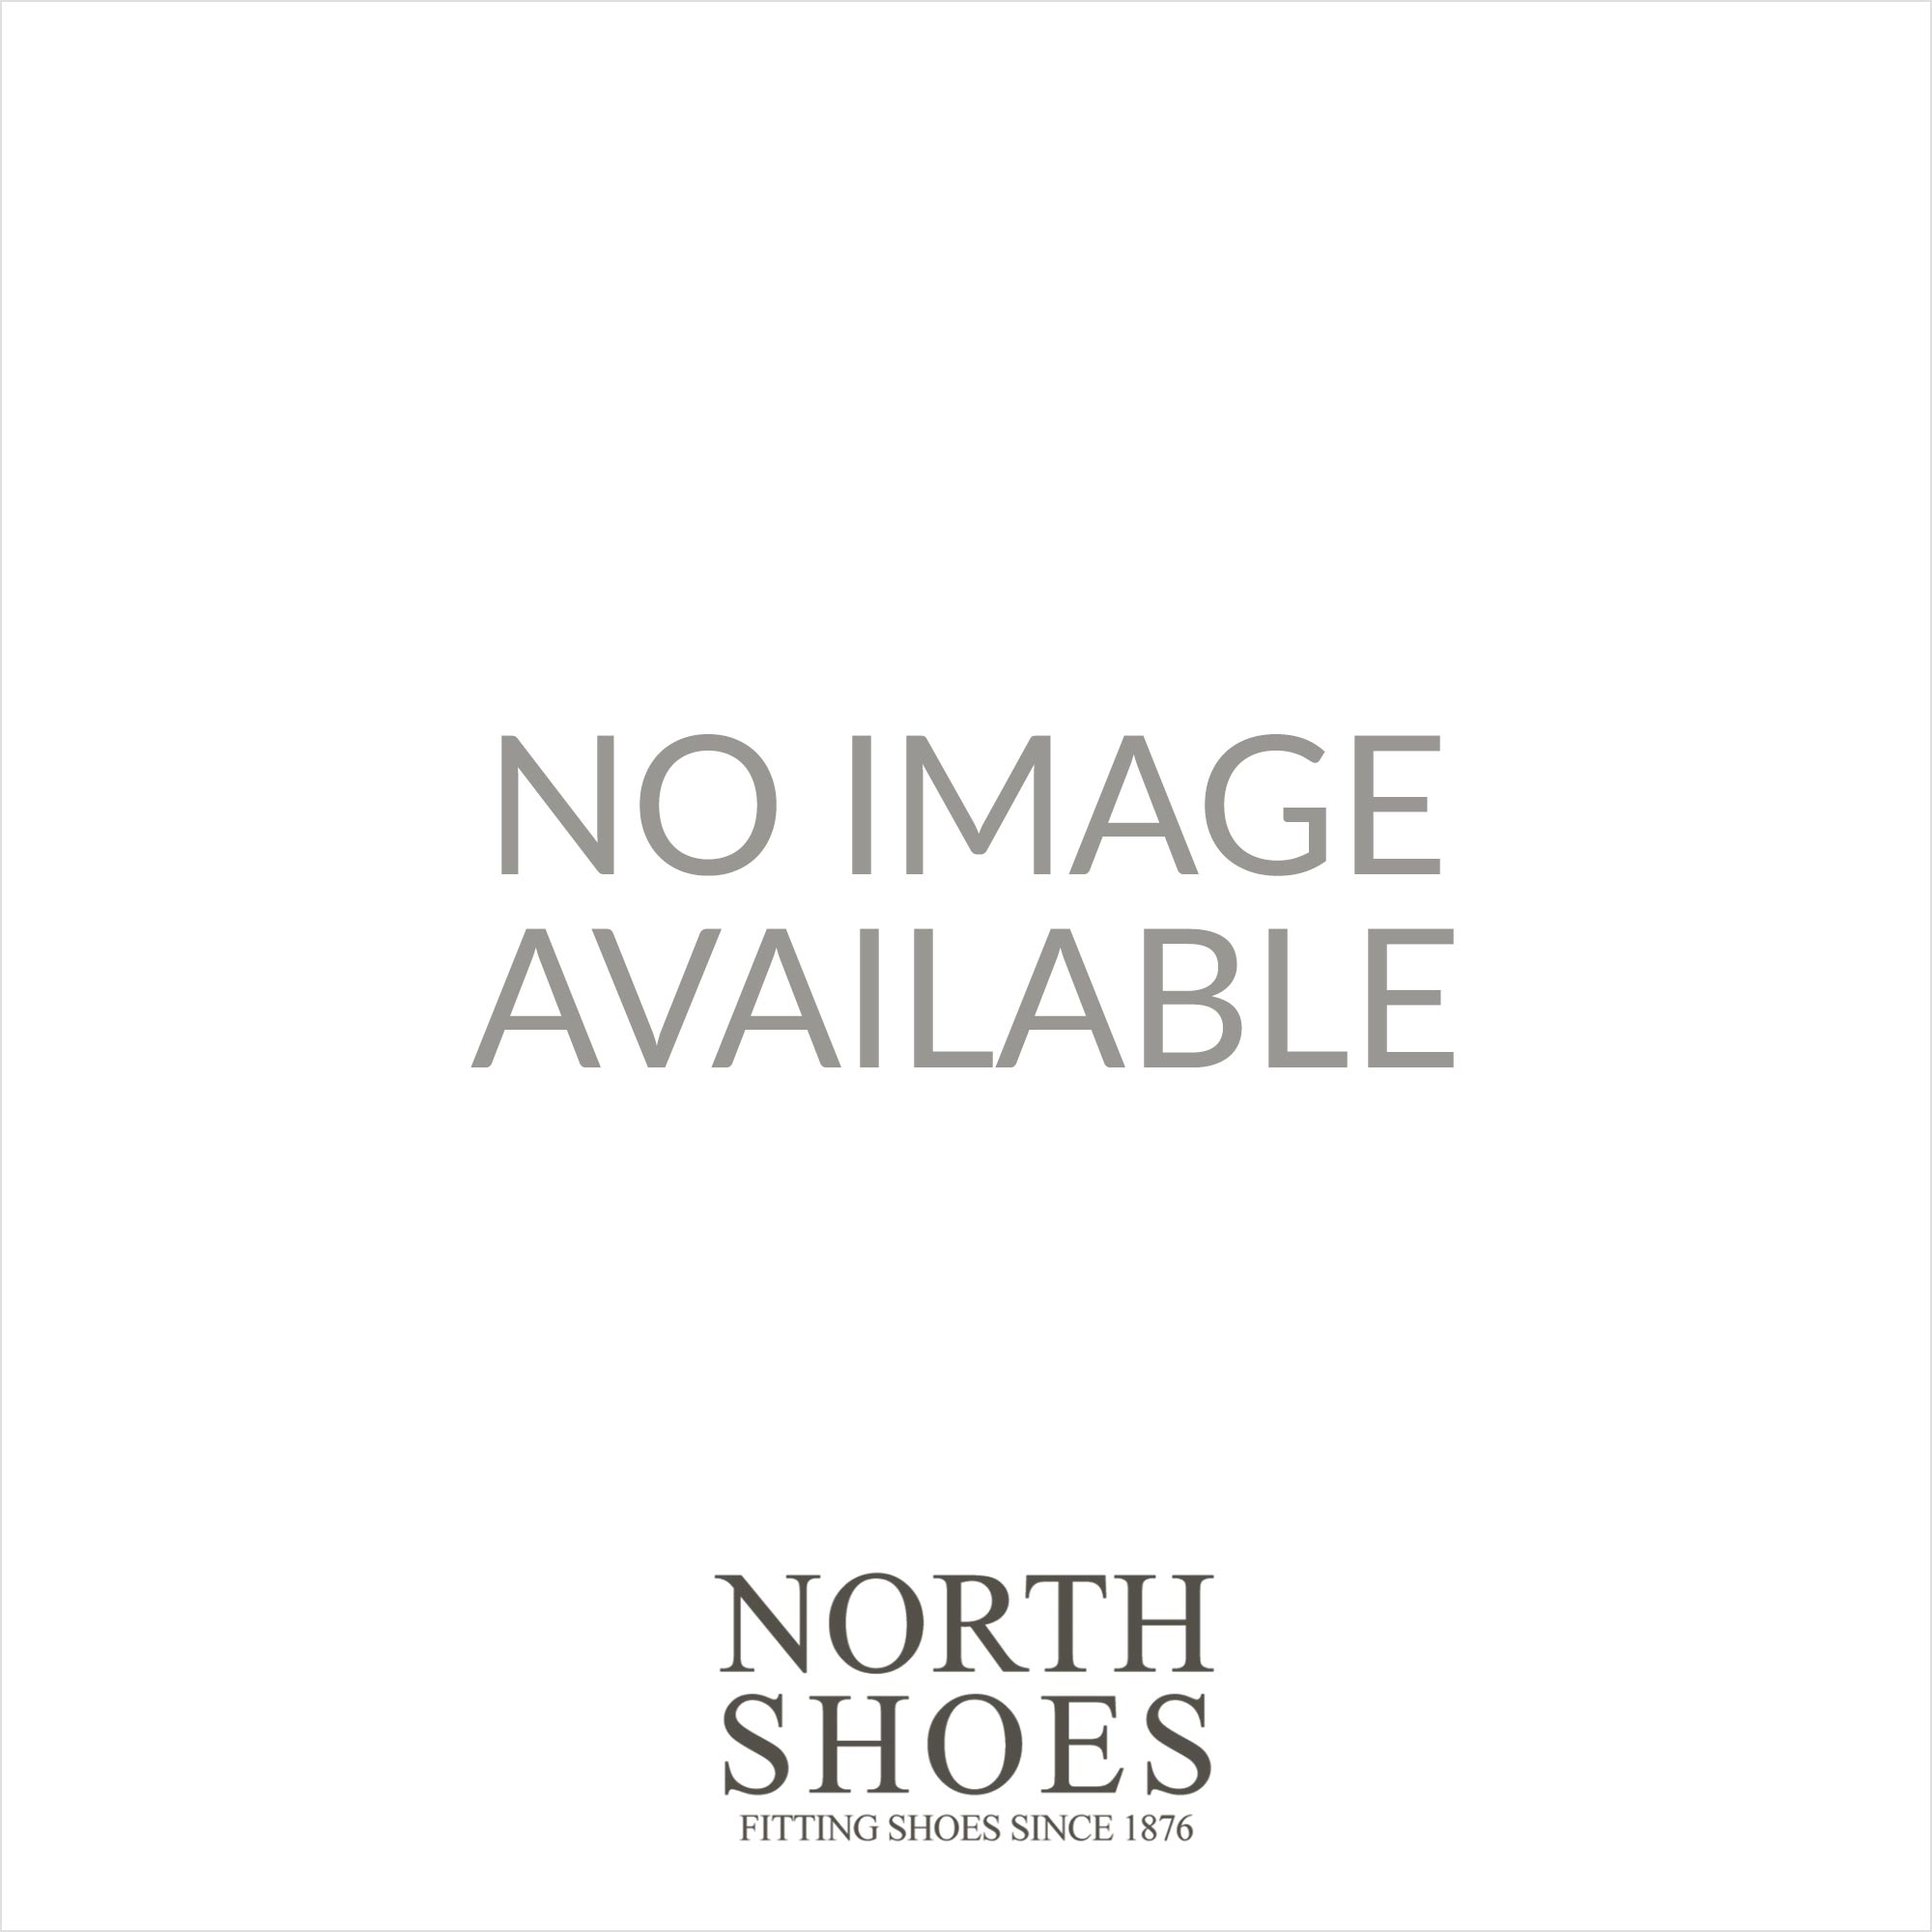 LOAKE Tarantula Tan Leather/Blue Suede Leather Mens Oxford Lace Up Brogue Shoe